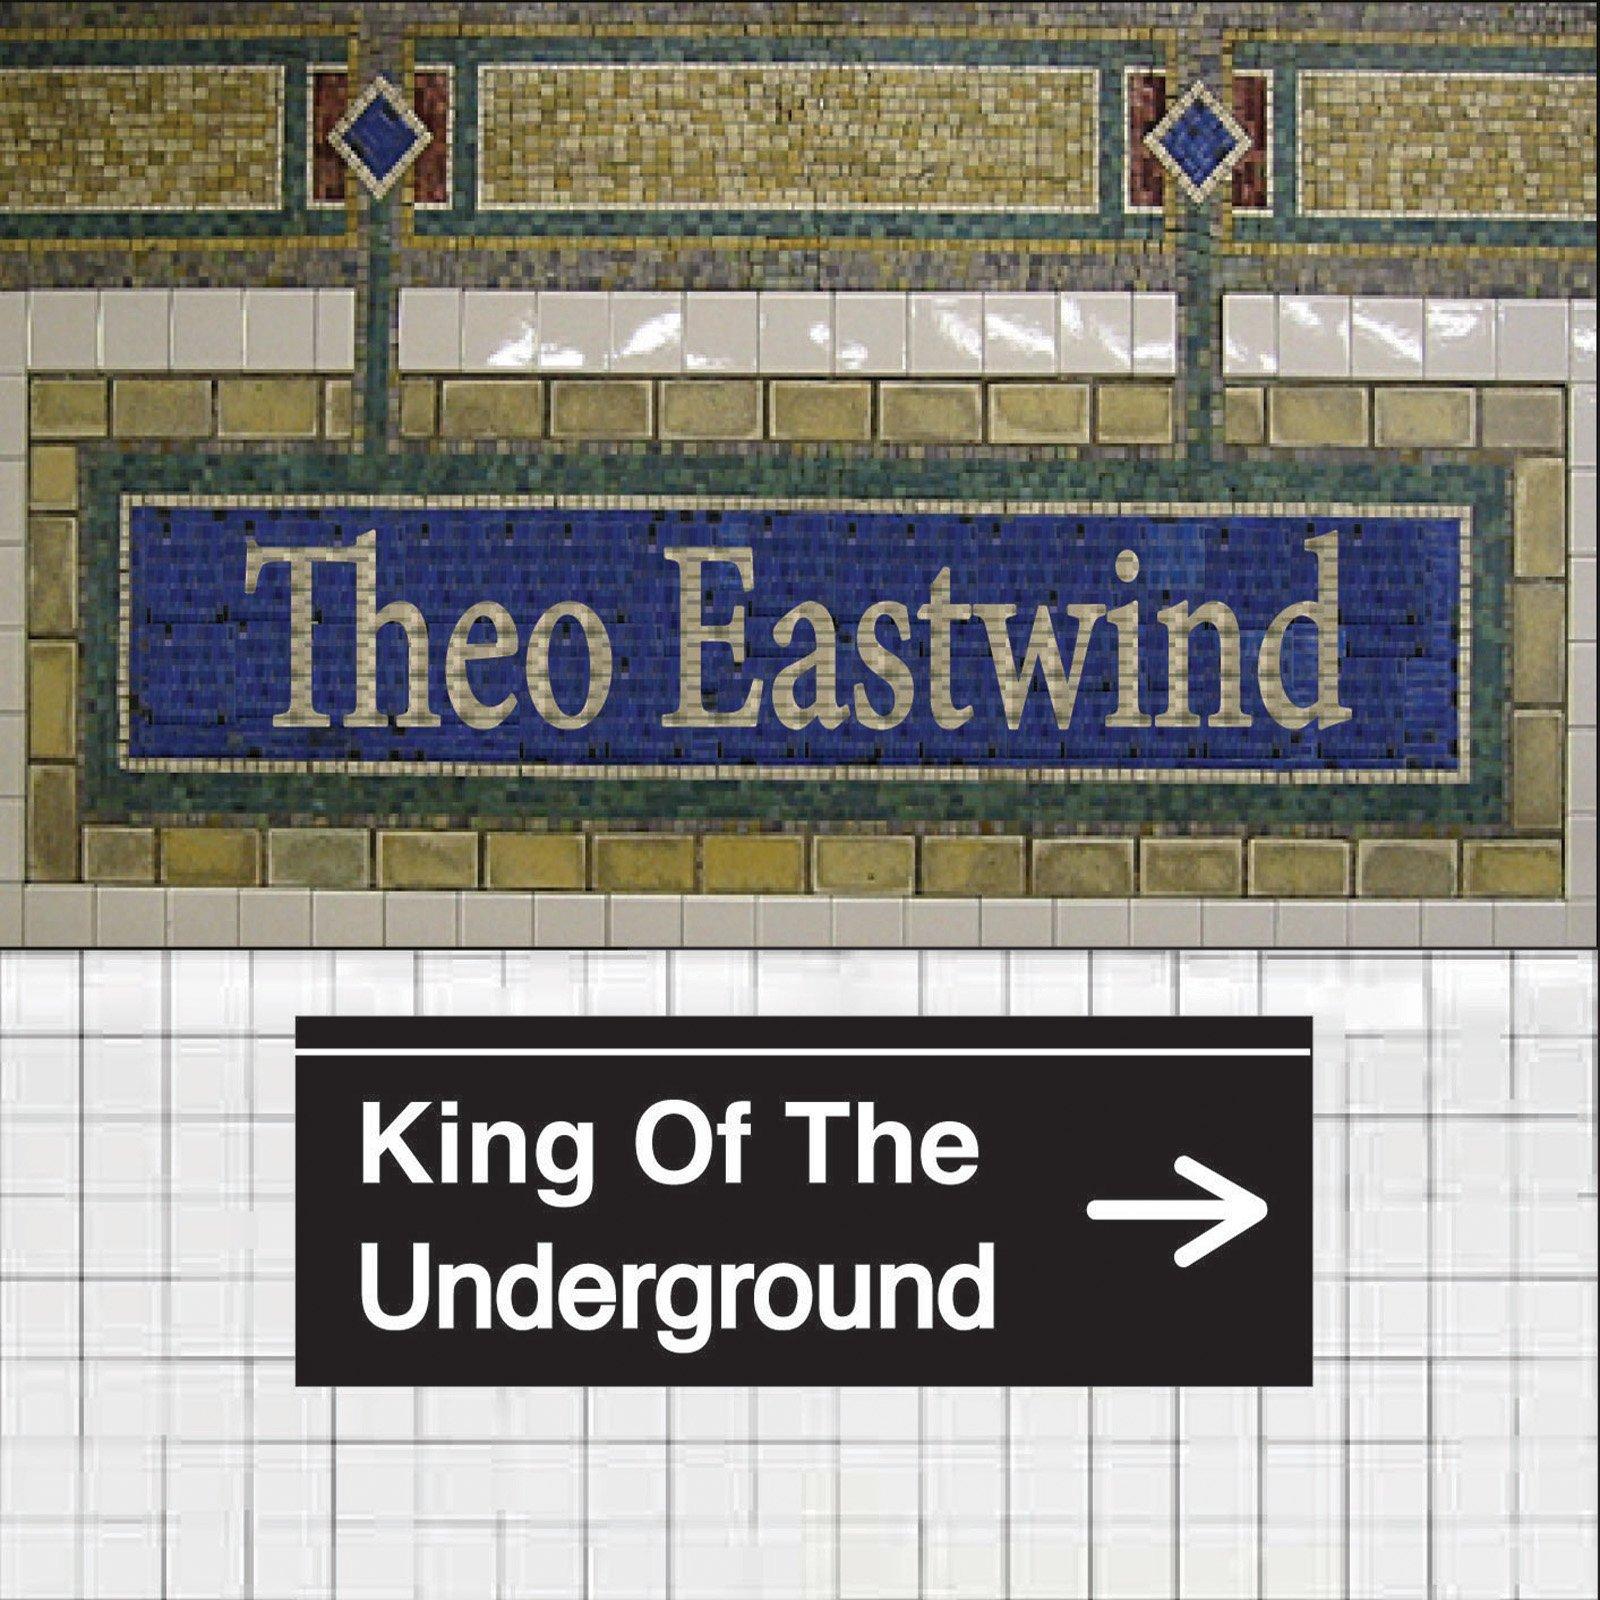 King of the Underground